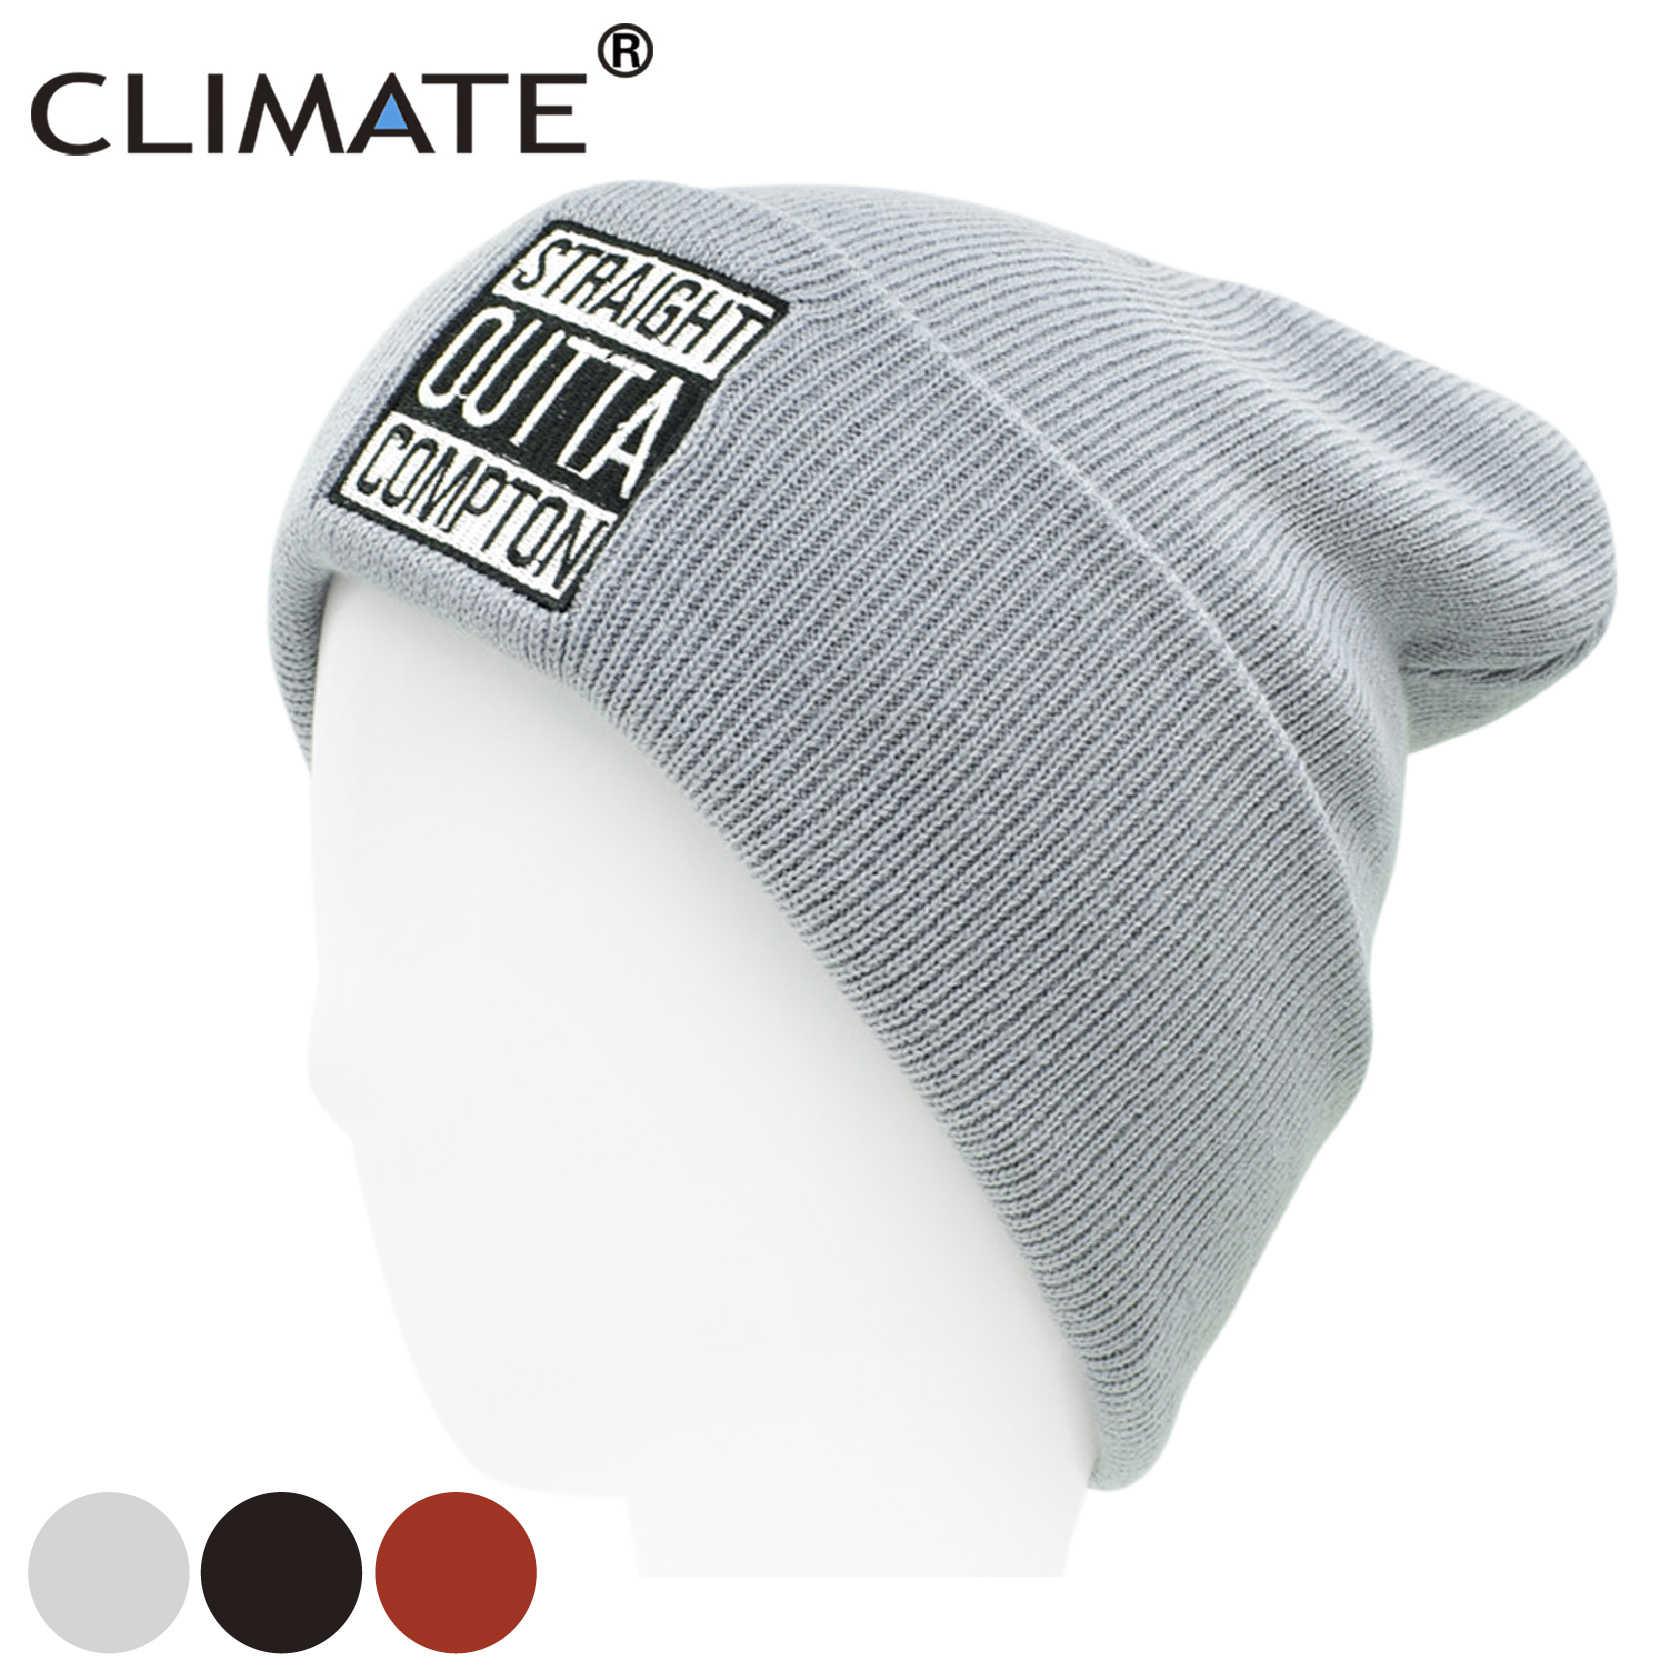 b4d9862f79d Detail Feedback Questions about CLIMATE Straight Outta Compton Hat Beanie  Men Logo Hat Winter Beanie Cap Men Women Warm Knit Beanie Black Hat Caps  for Men ...